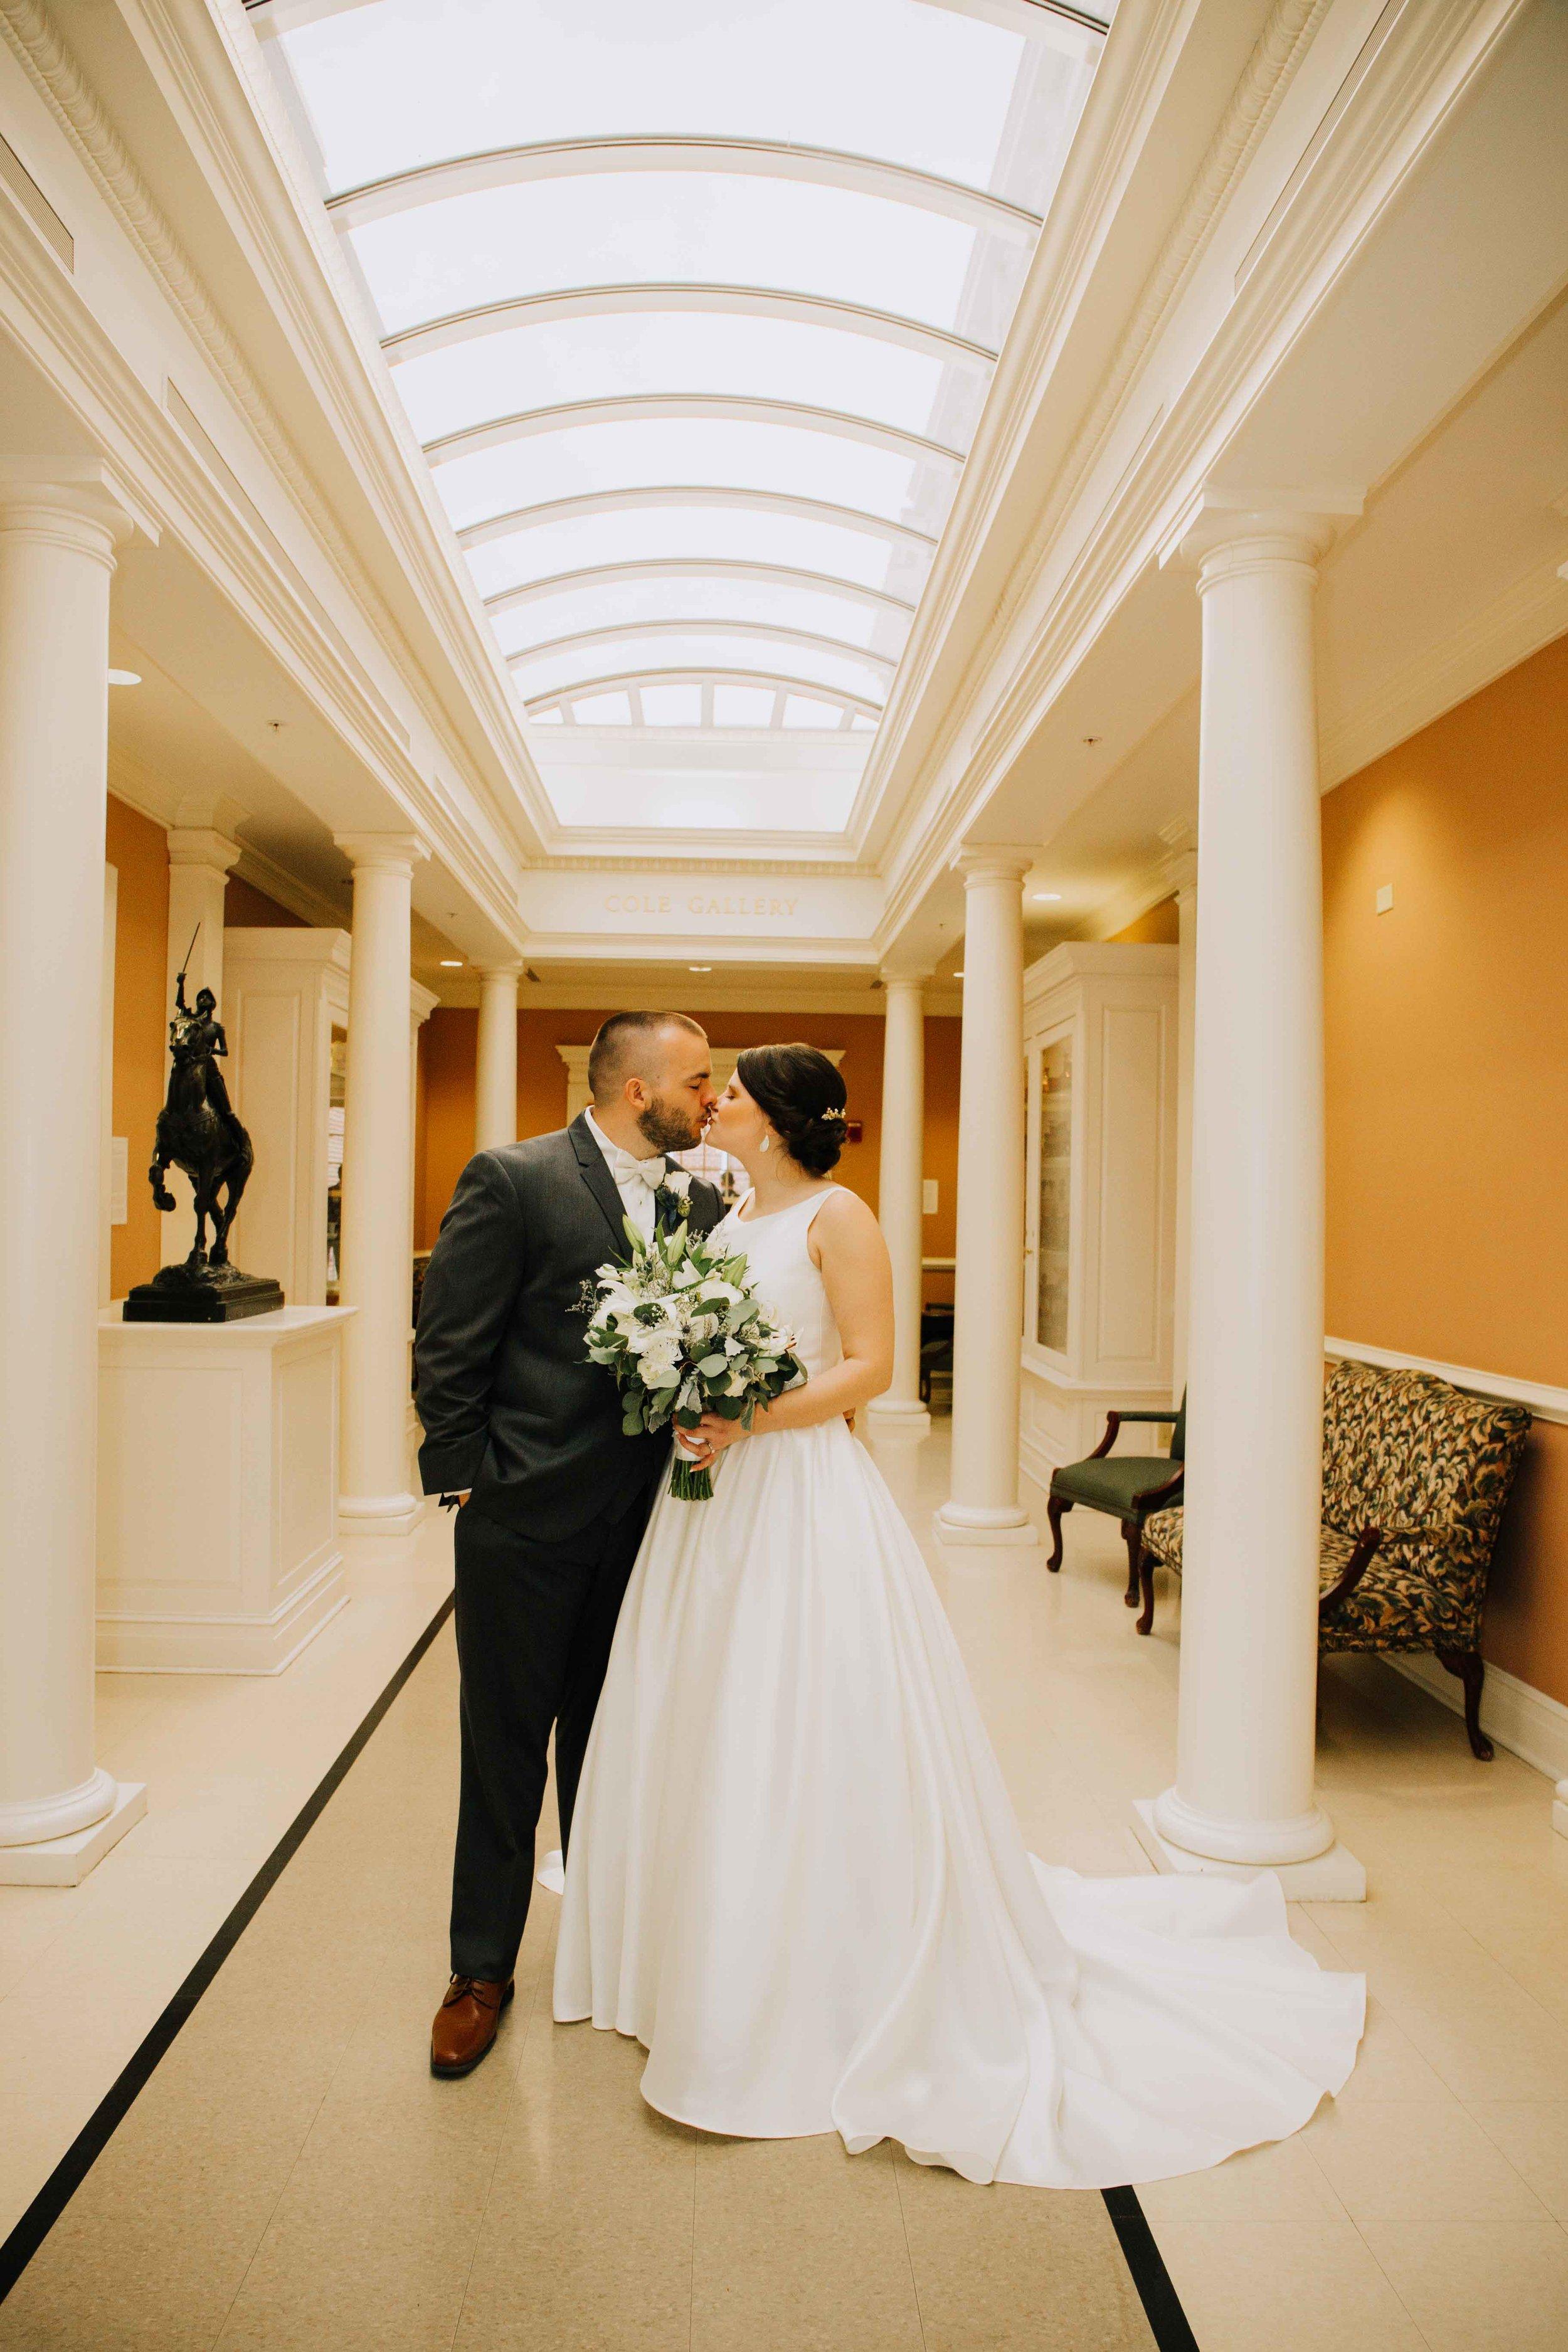 Farmville-Virginia-Wedding-Hotel-Weynoke-Downtown-Jacqueline-Waters-Photography-Detailed- (1105).jpg